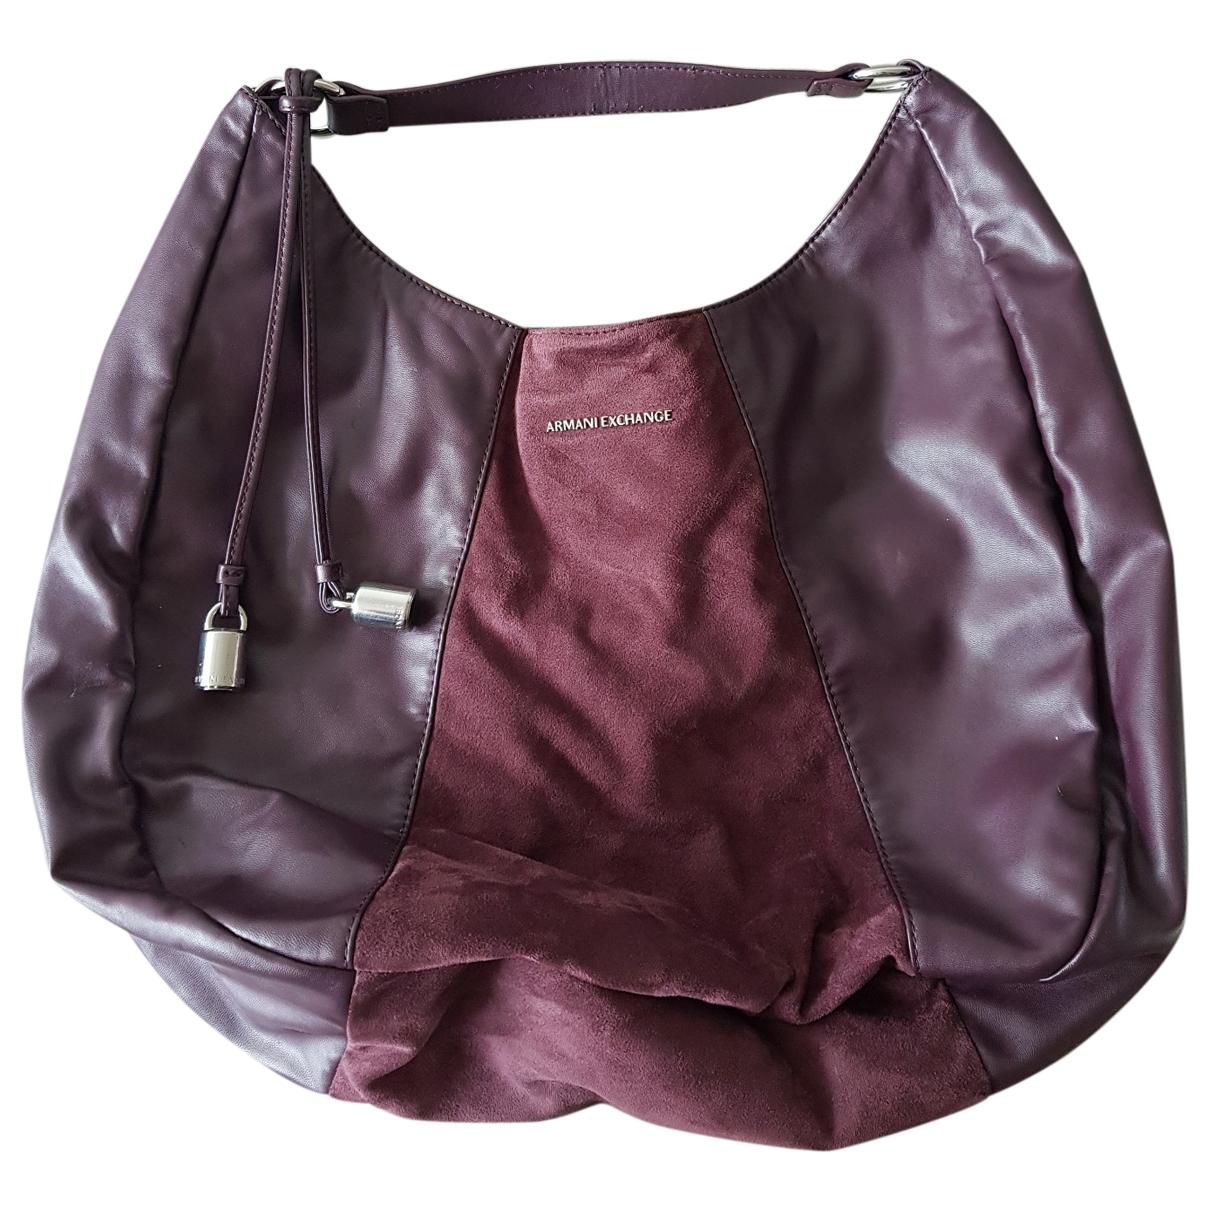 Emporio Armani \N Burgundy handbag for Women \N